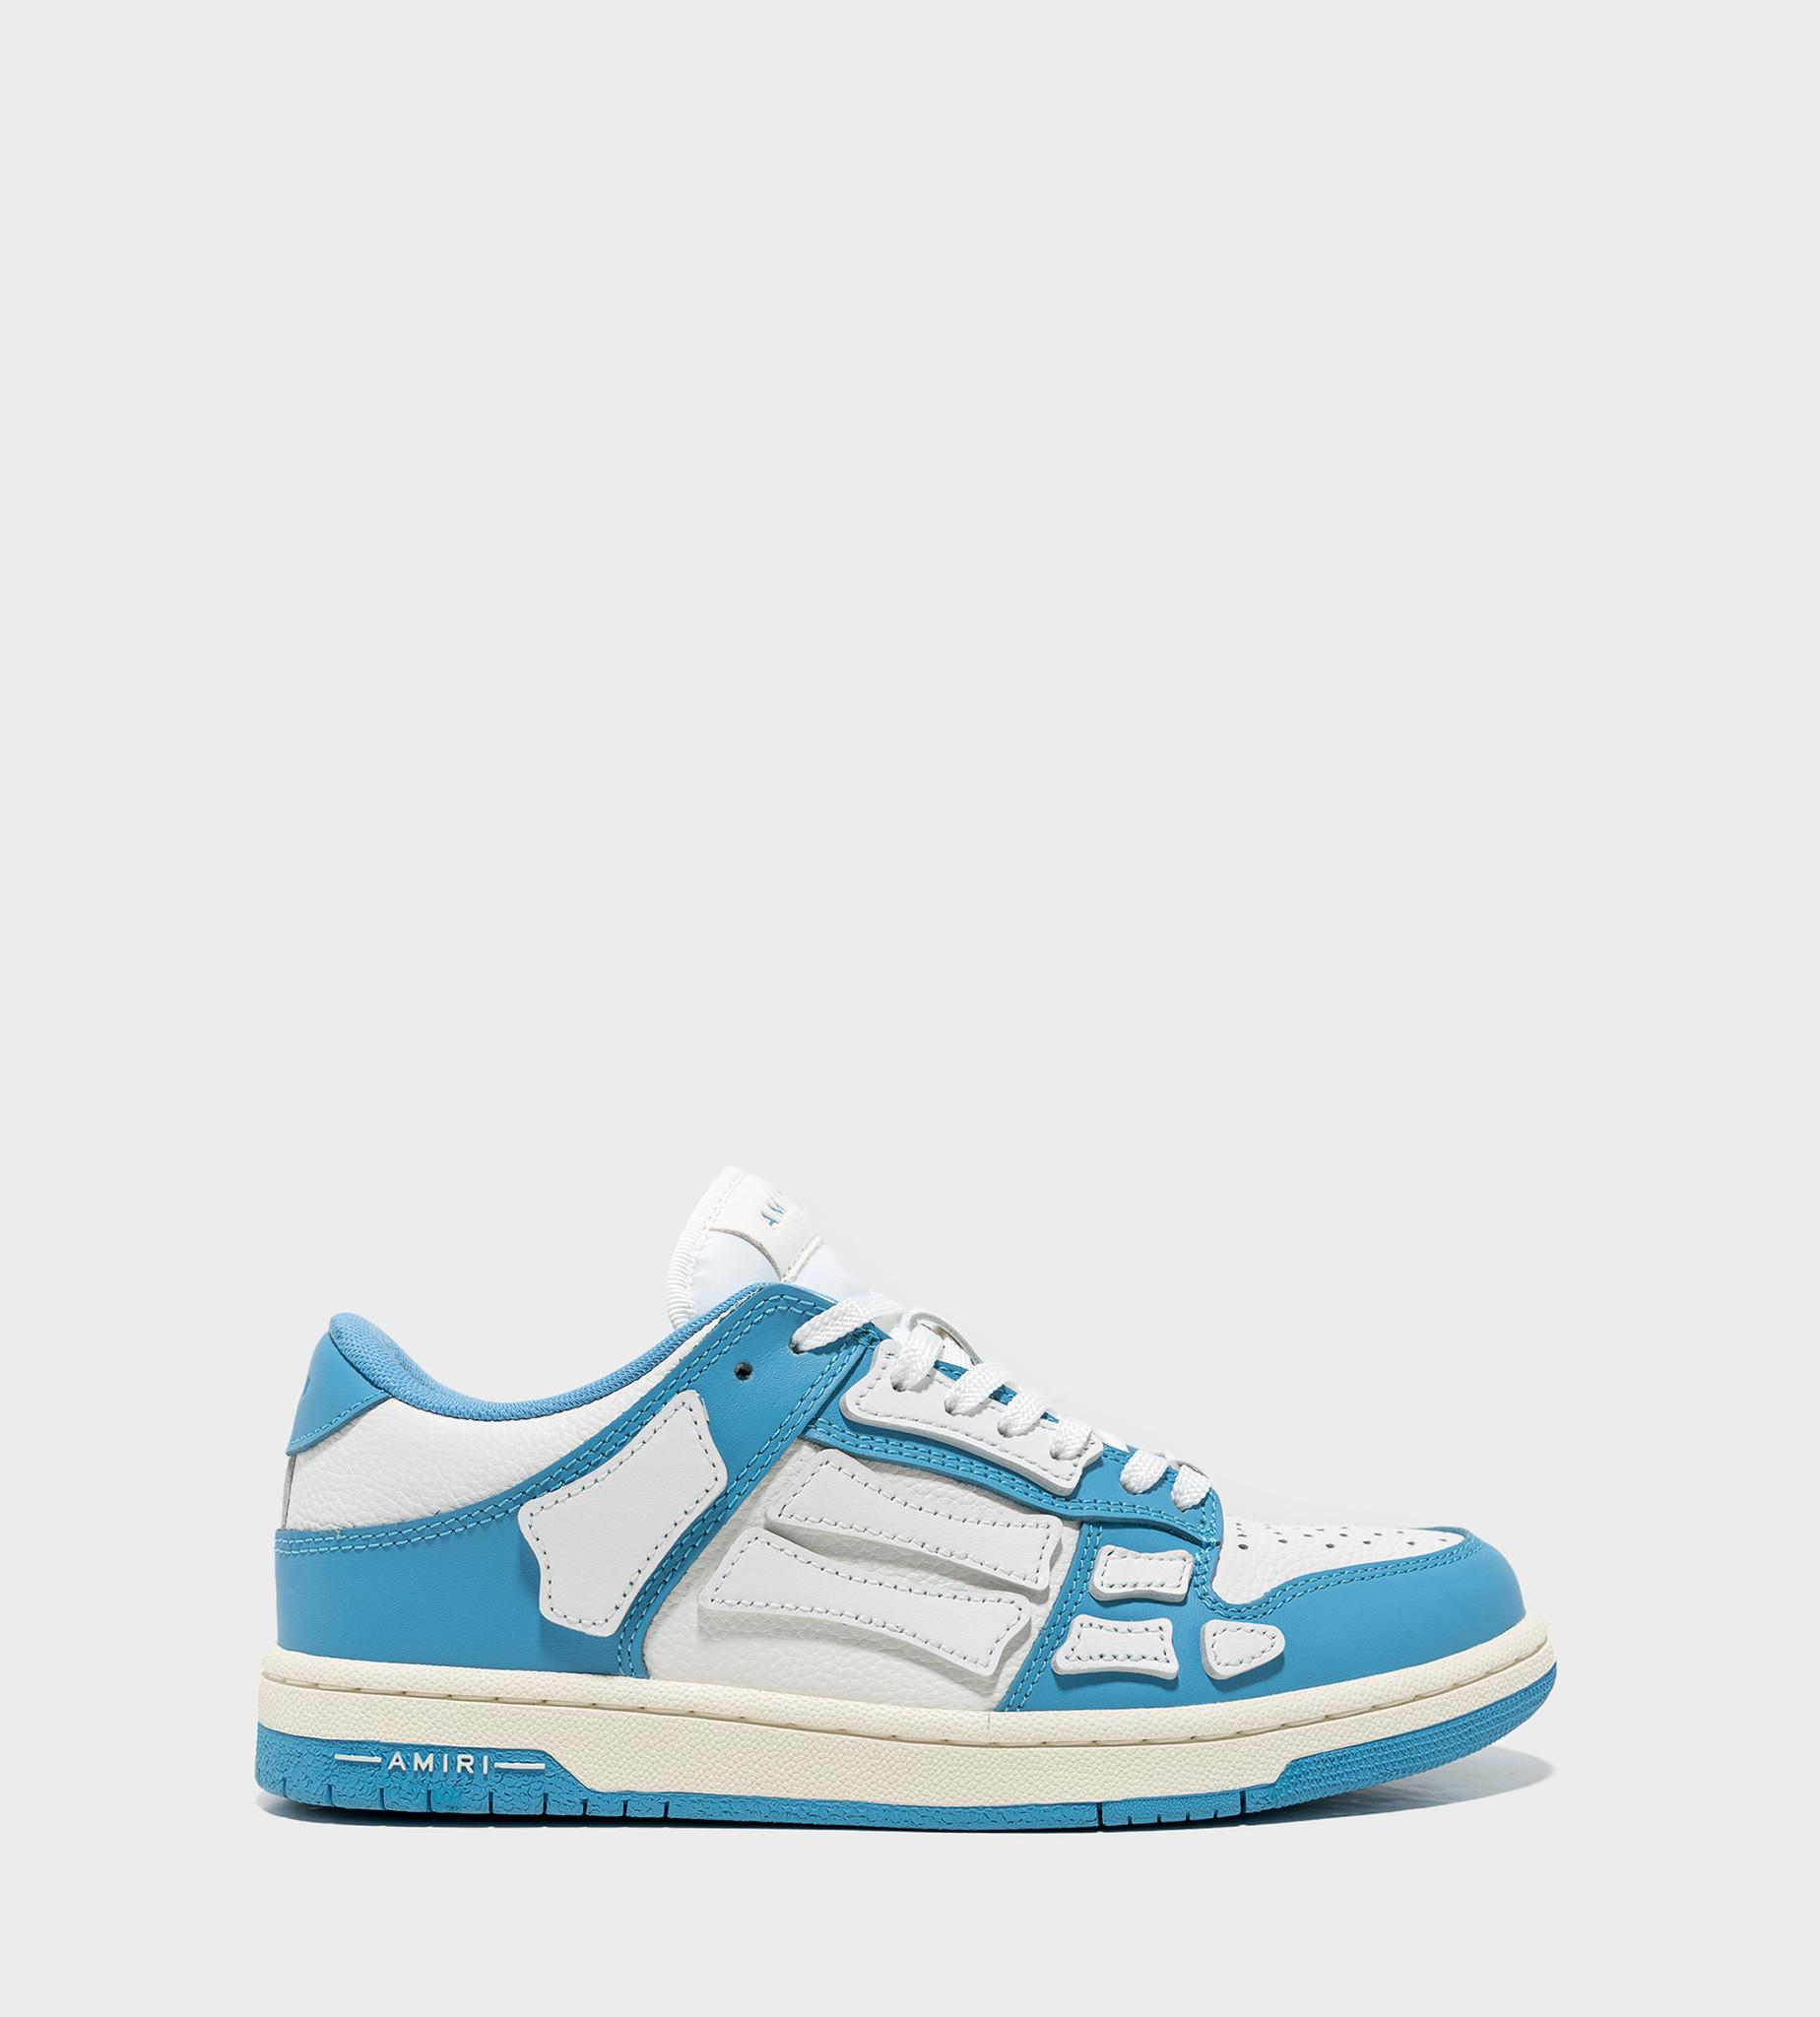 AMIRI AMIRI Skeleton Low Sneaker Blue